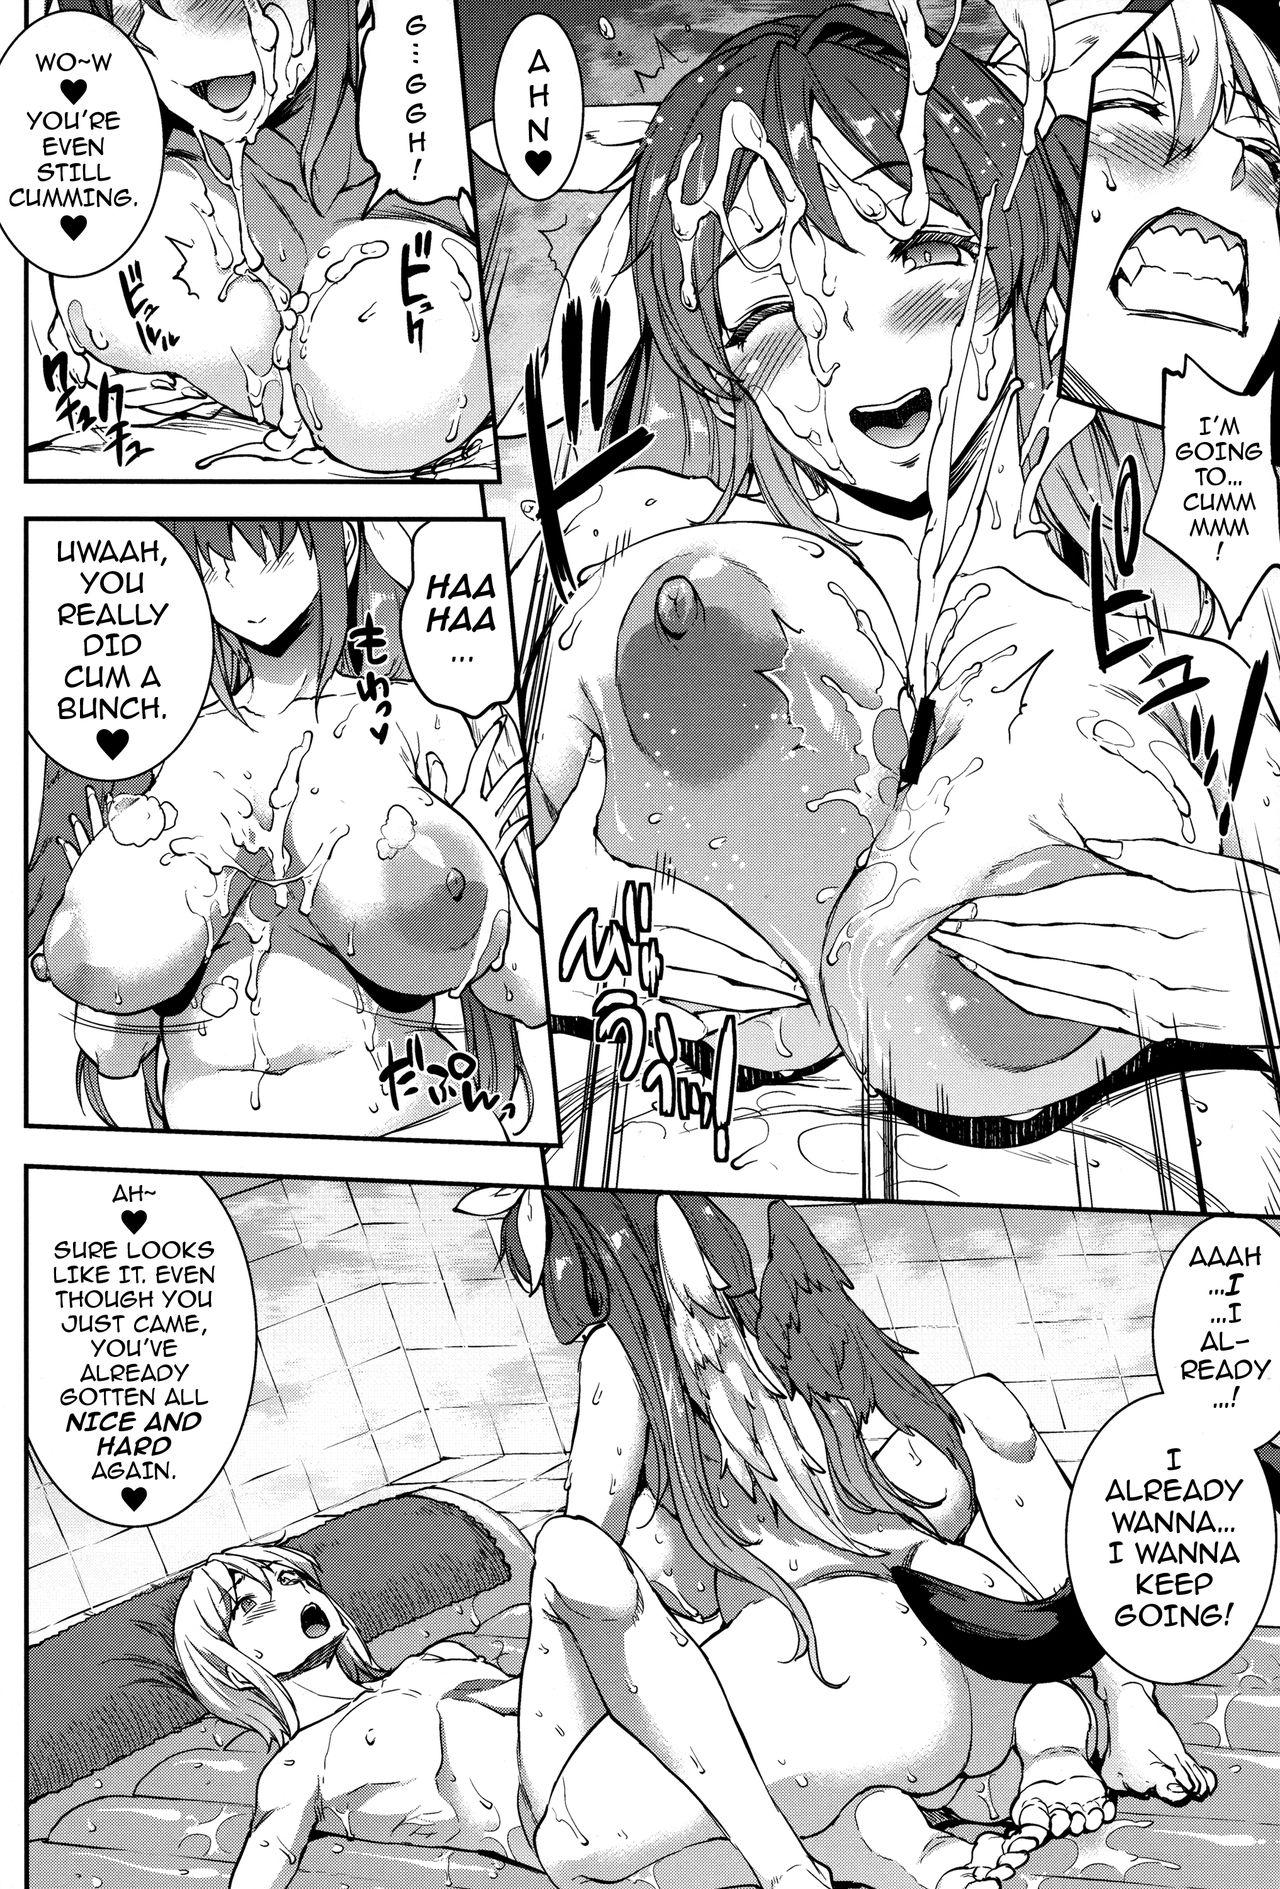 (C91) [ERECT TOUCH (Erect Sawaru)] Osanazuma Bakunyuu Nurunuru Soap-jou | Big-Breasted Soapy Massage Giving Young Wife (Guilty Gear)  [English] {darknight} 16